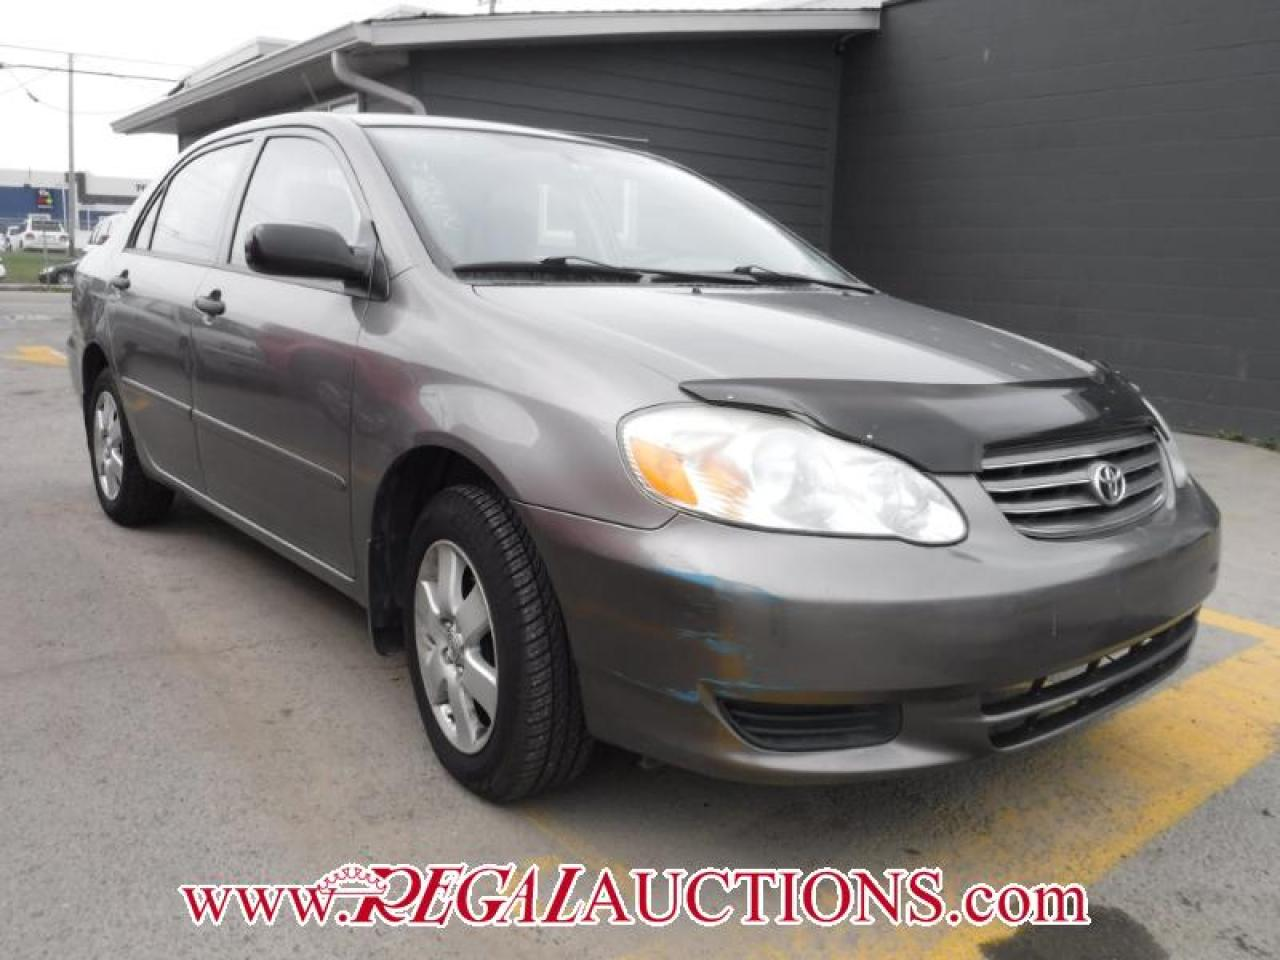 Photo of Grey 2004 Toyota Corolla